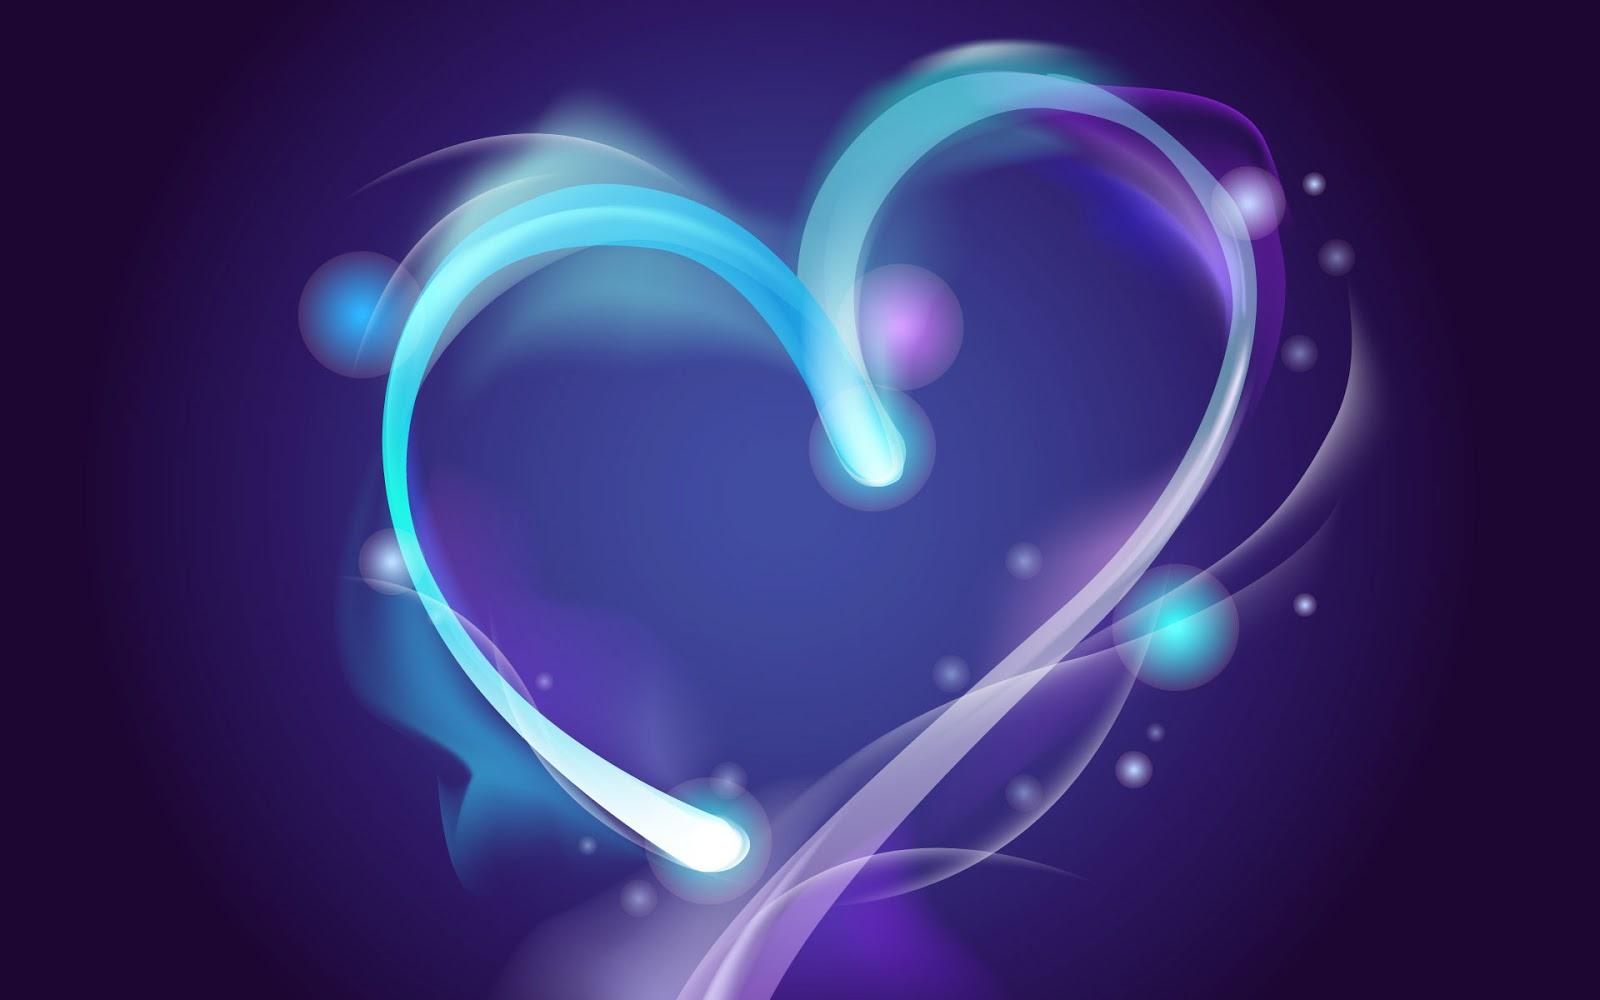 Wallpaper Heart Love Backgrounds : Wallpaper Desk : Heart love background, wallpaper hearts loveWallpaper Desk